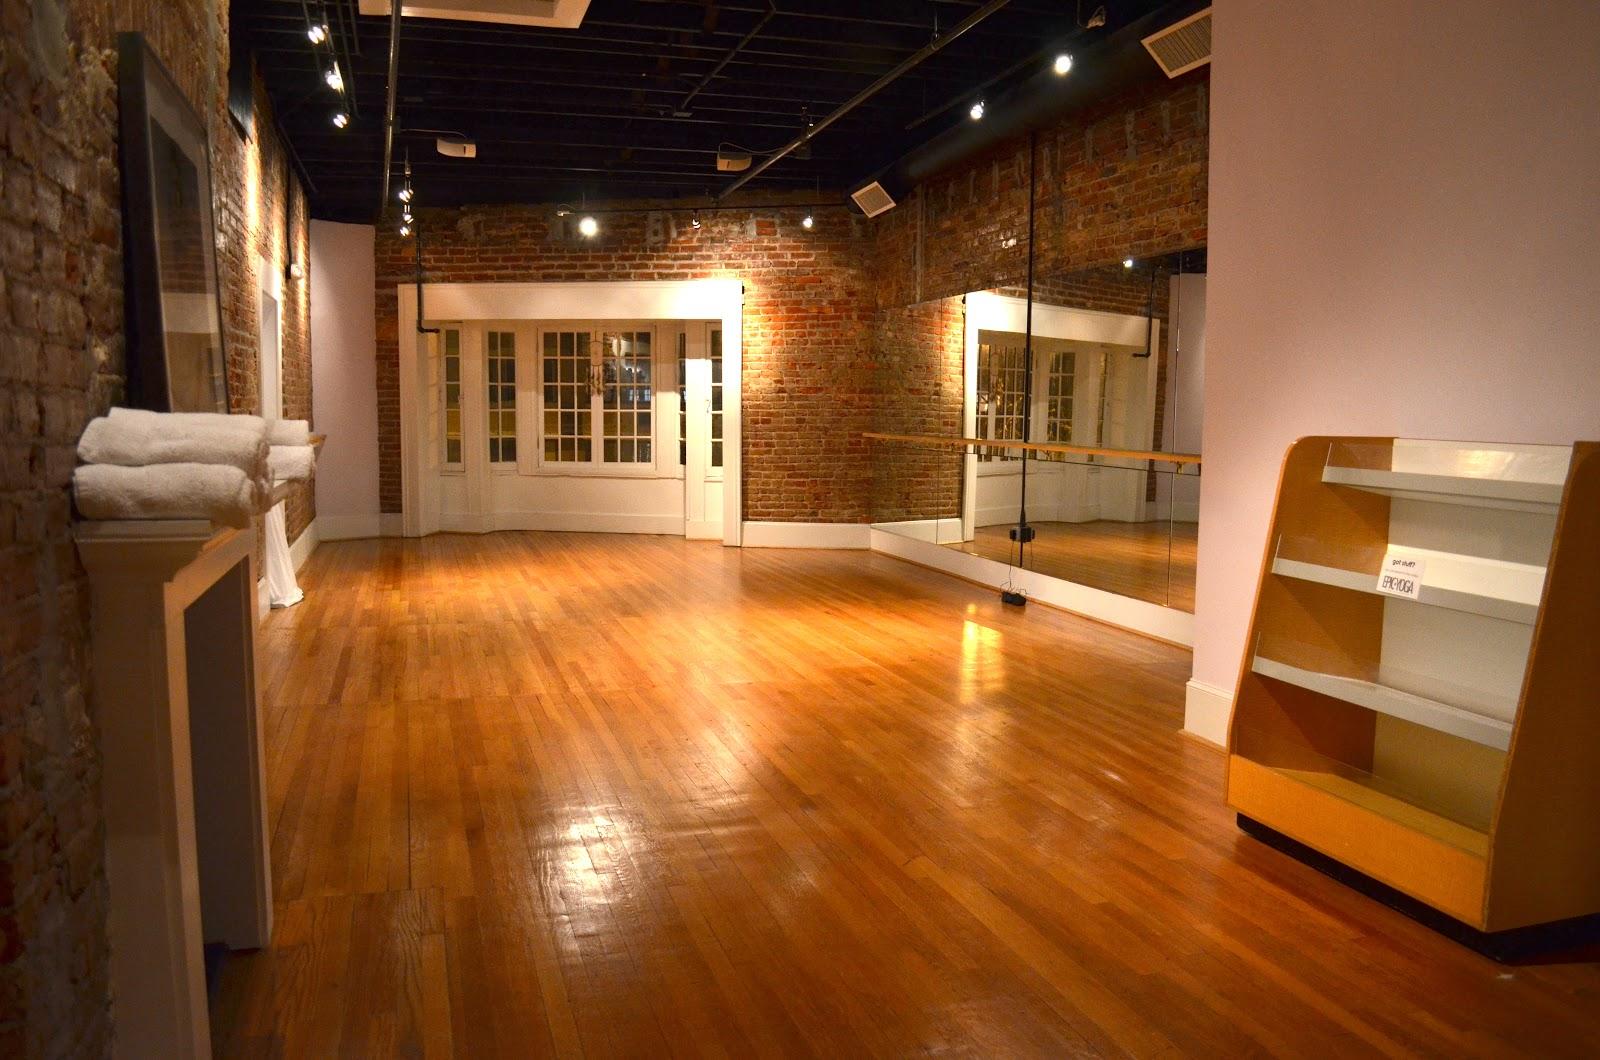 studio647 meet me at the barre the home dance studio. Black Bedroom Furniture Sets. Home Design Ideas